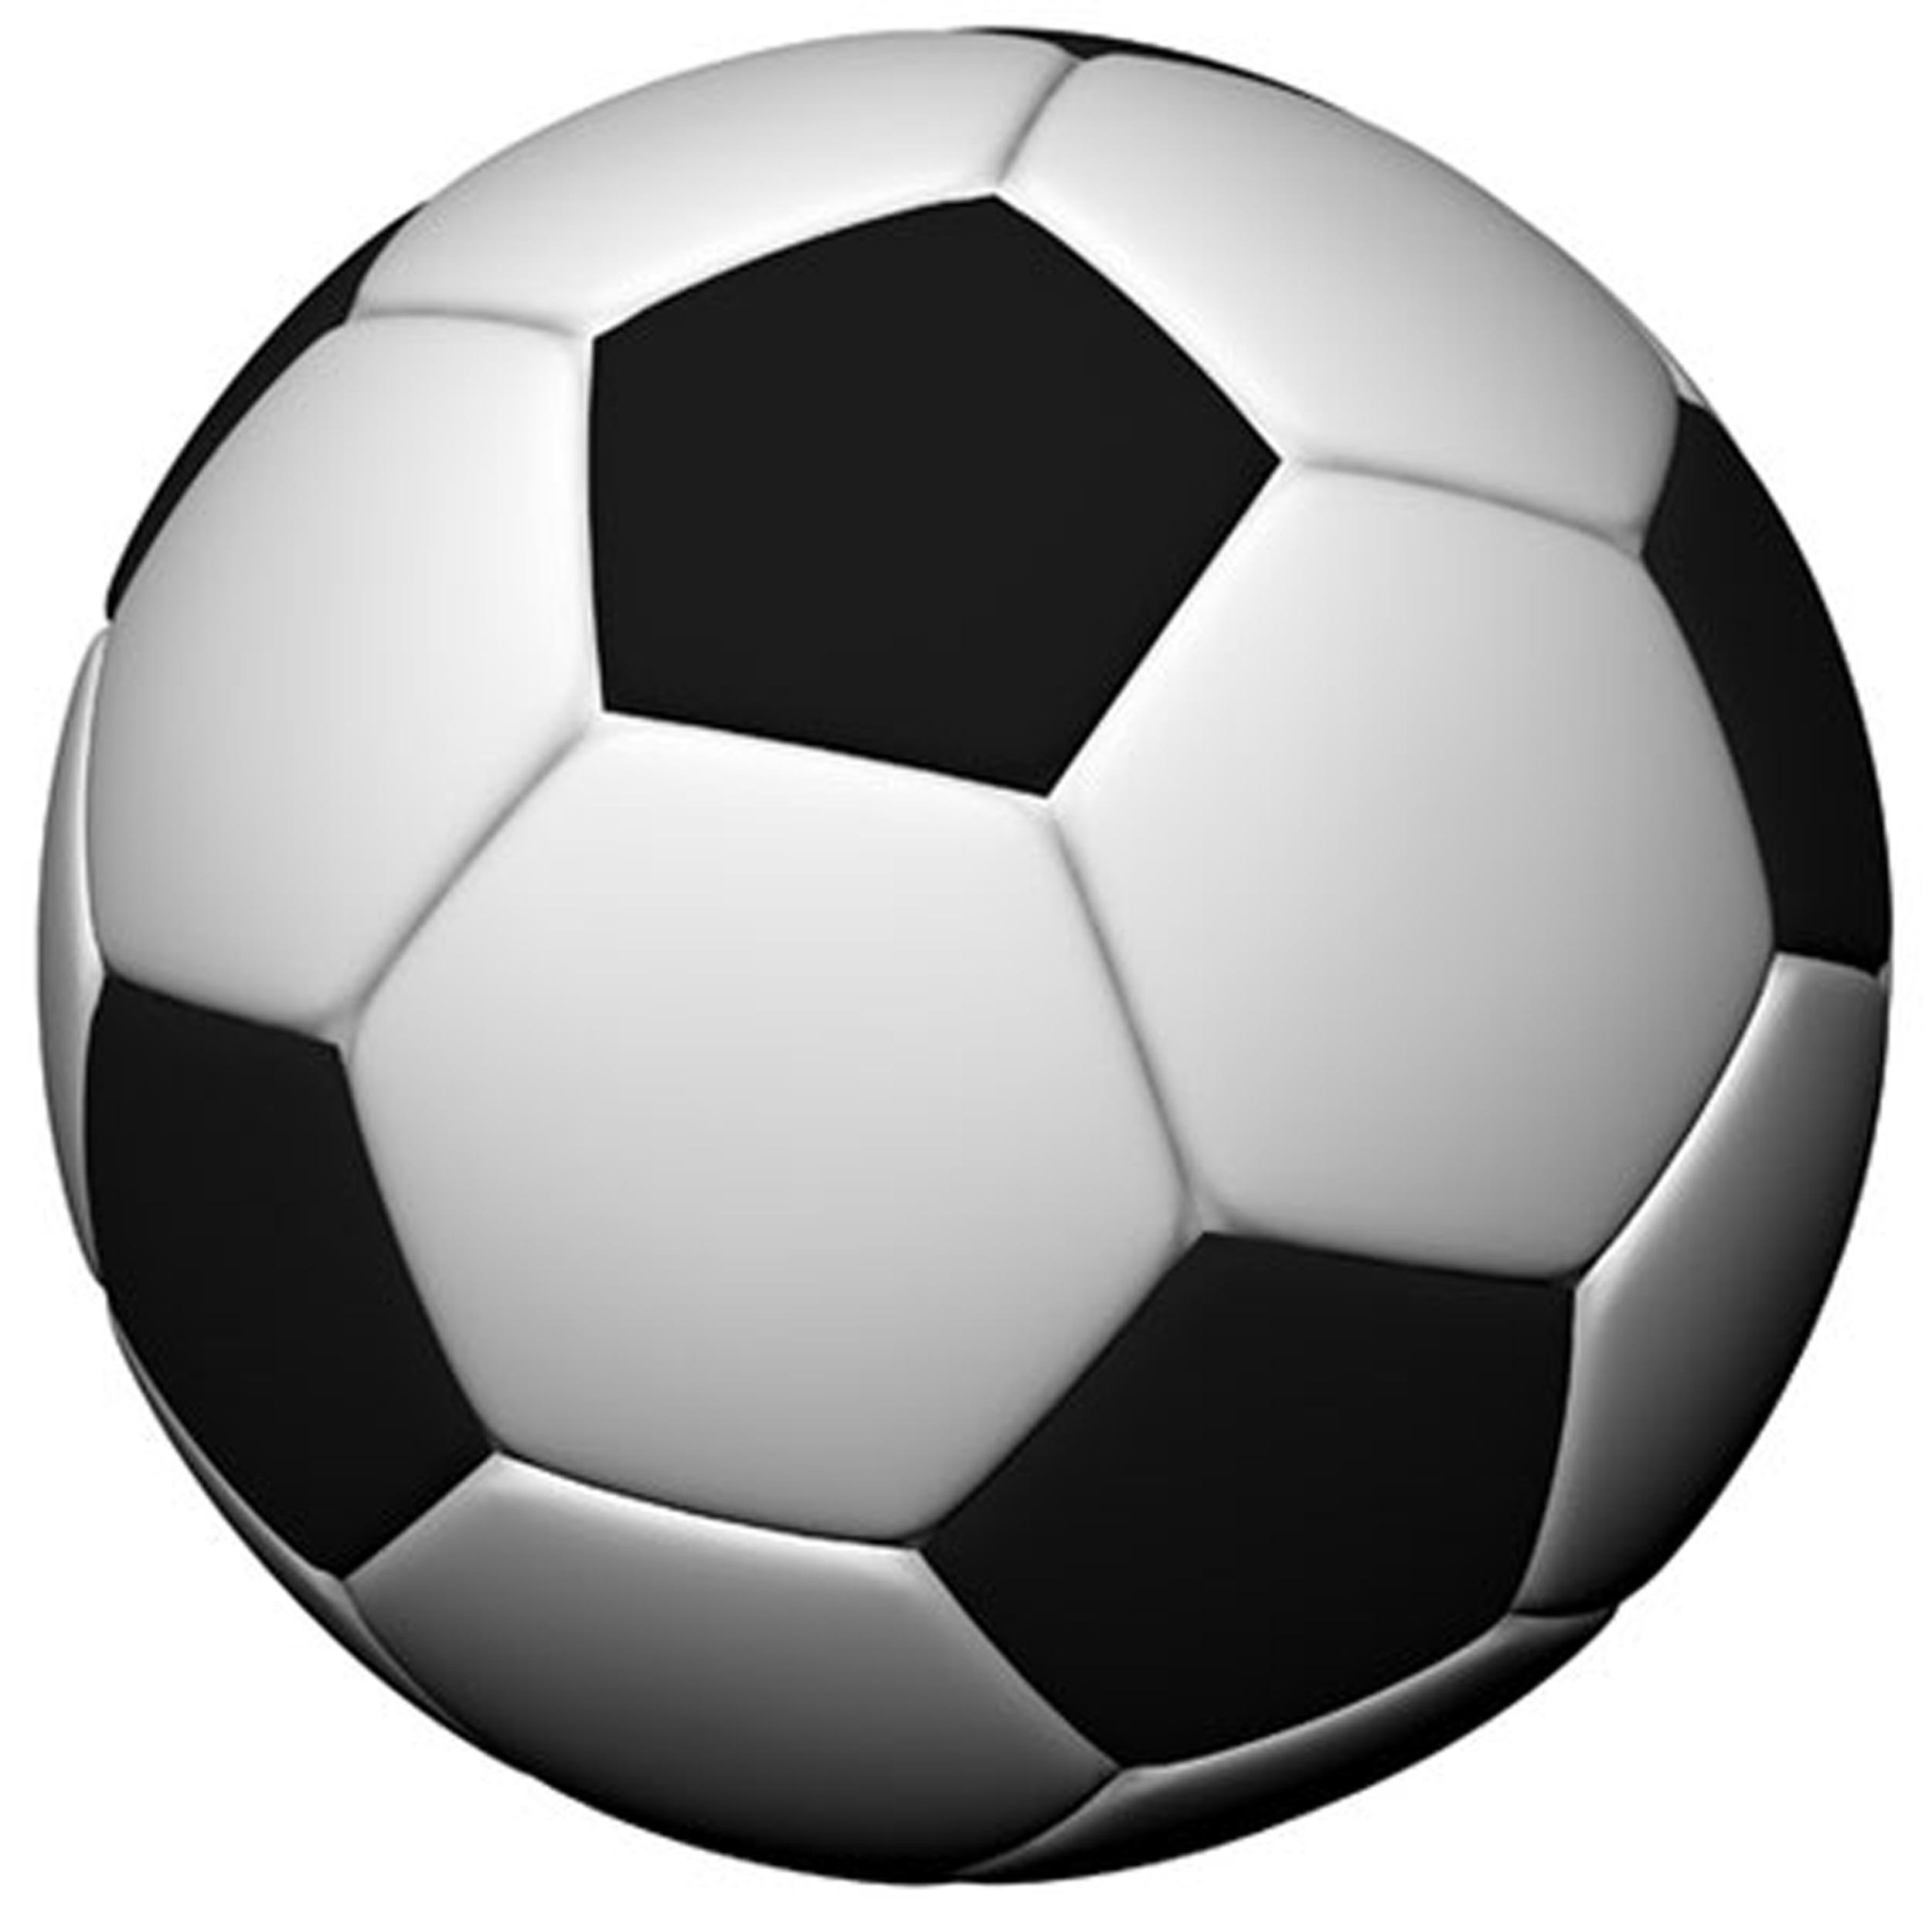 Classic Football Design